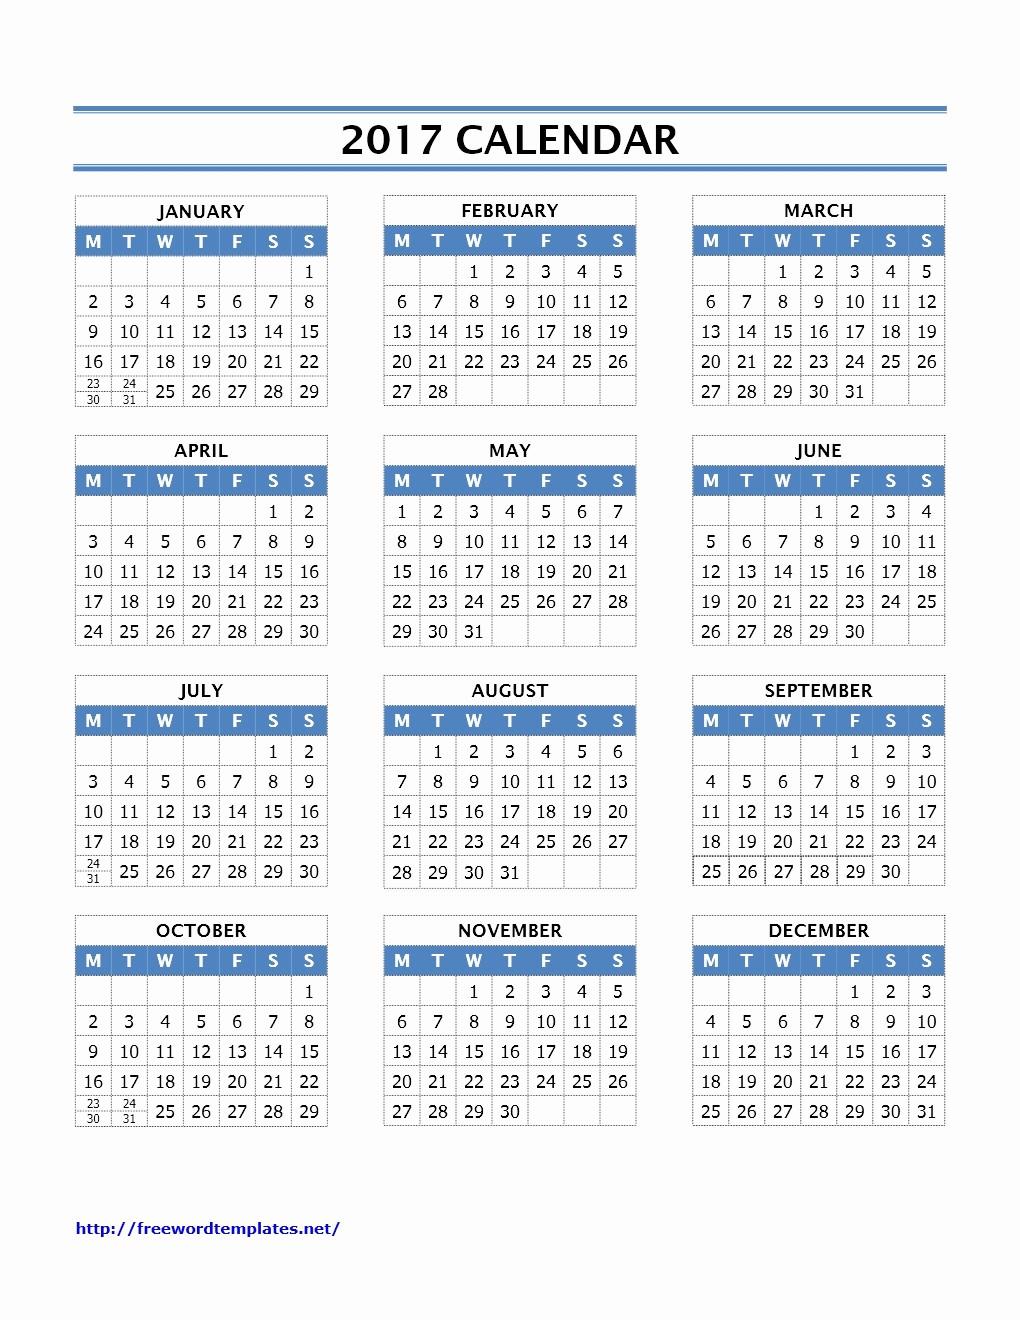 2017 Calendar with Holidays Template Beautiful Calendar Archives